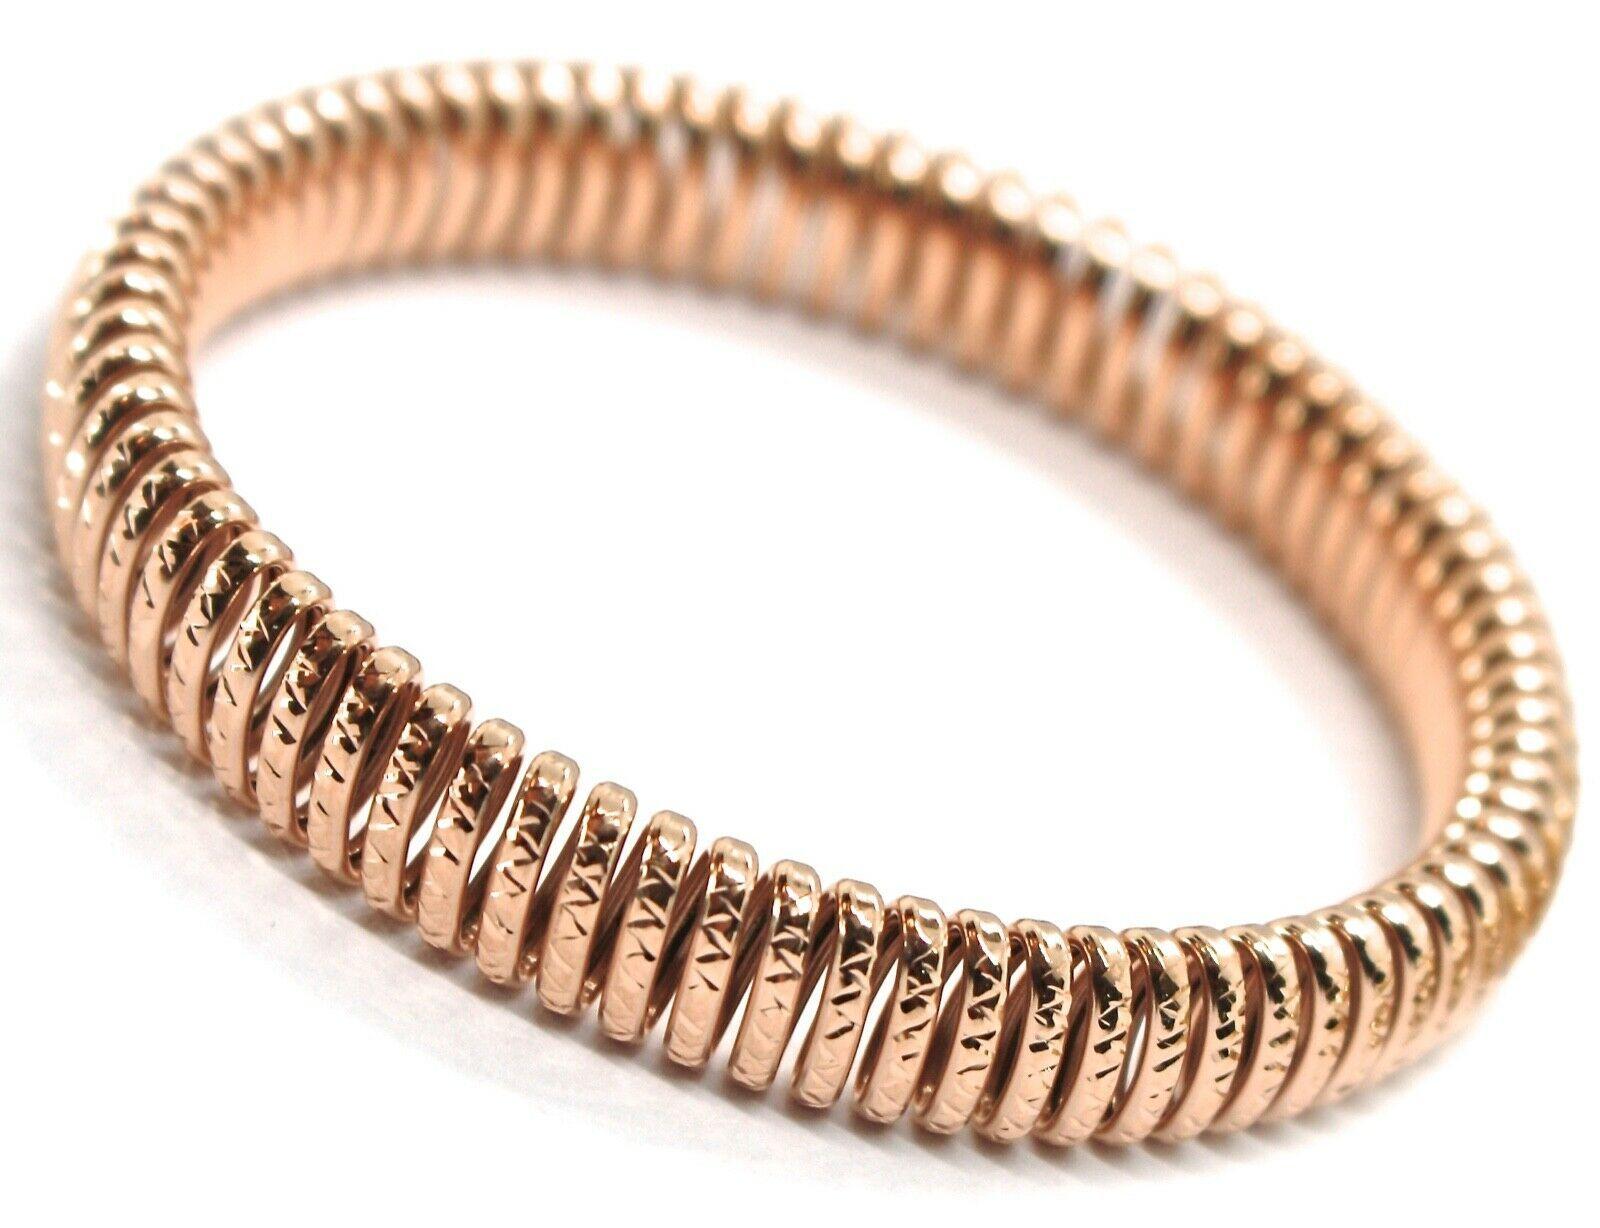 GOLD BRACELET 750 18K, YELLOW 0,5 WHITE 0,5 PINK, SEMI-RIGID, MILLED, ELASTIC image 3